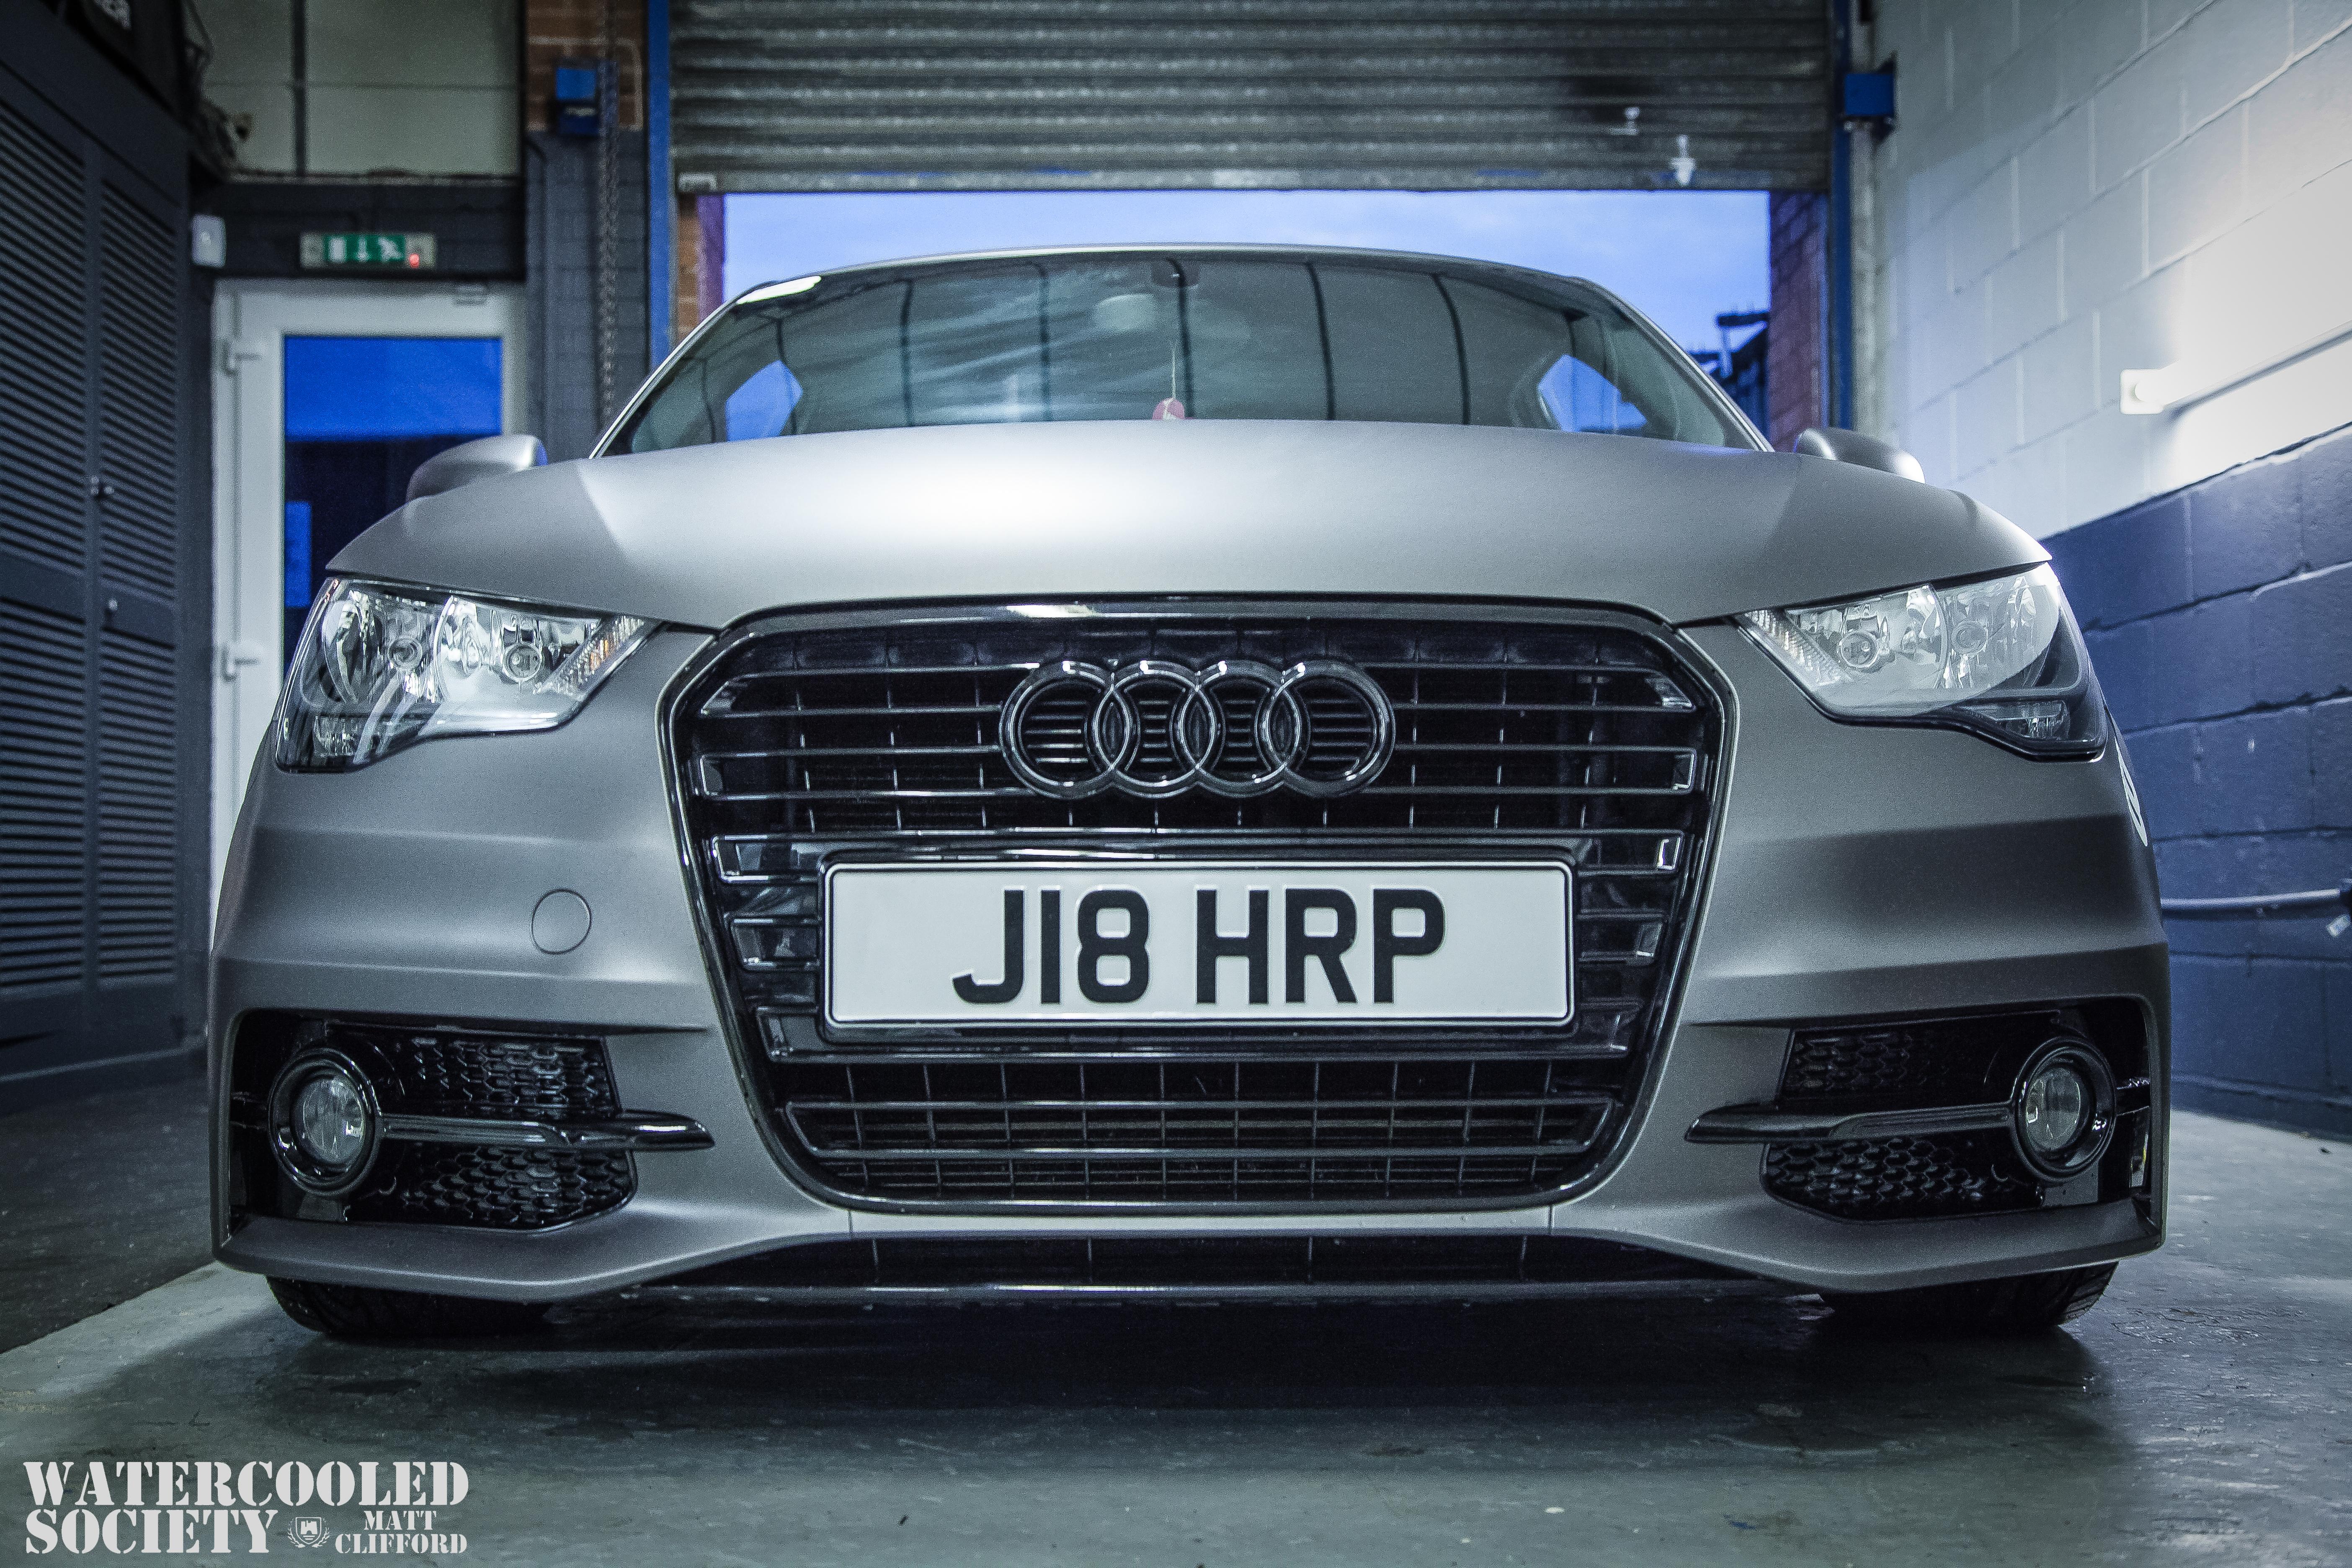 James Harpers Audi A MATT MEDIA - Harper audi